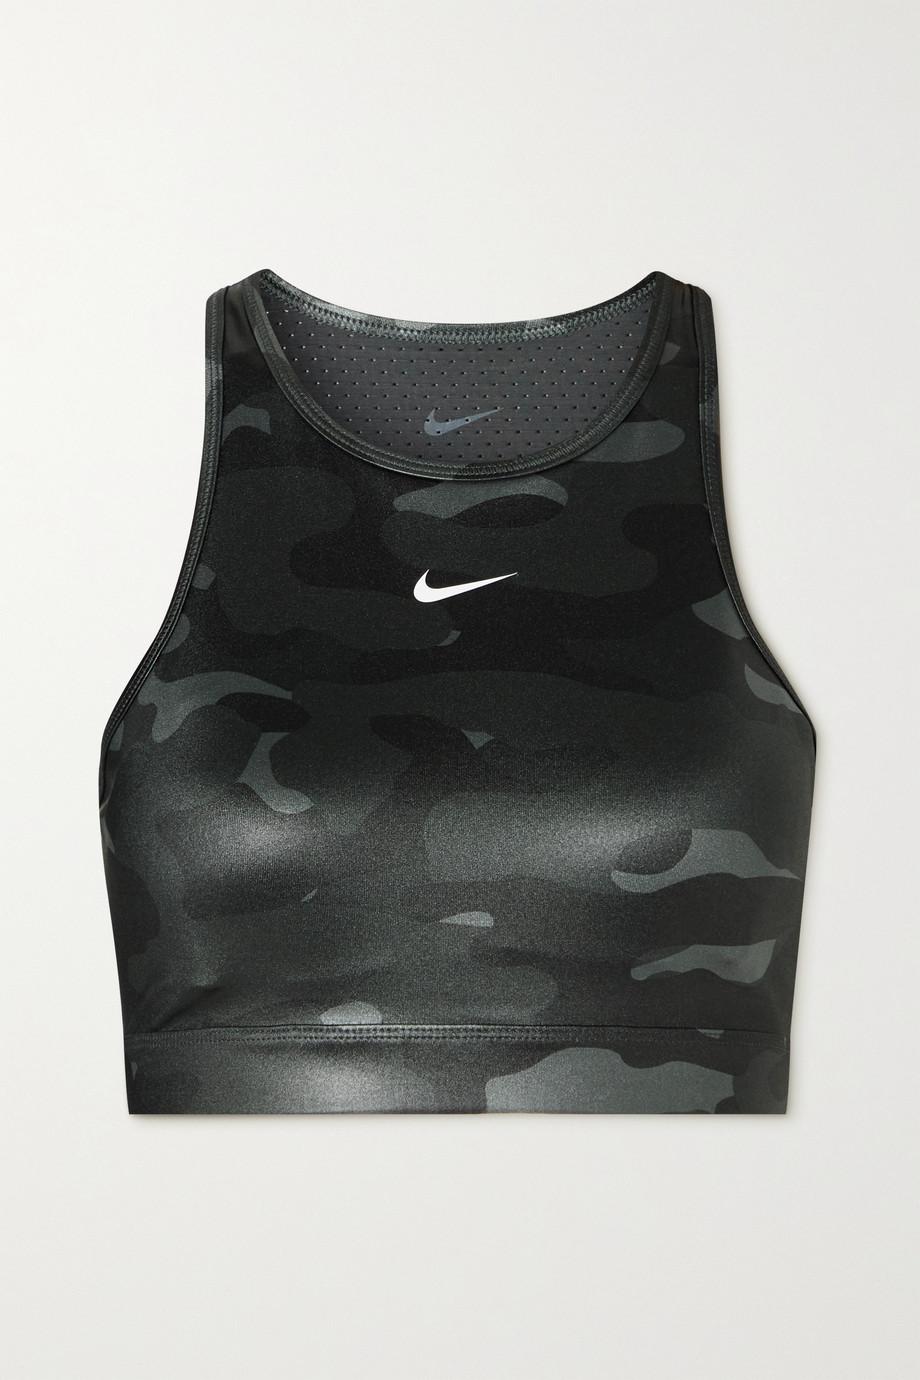 Nike Swoosh mesh-paneled cutout camouflage-print Dri-FIT sports bra